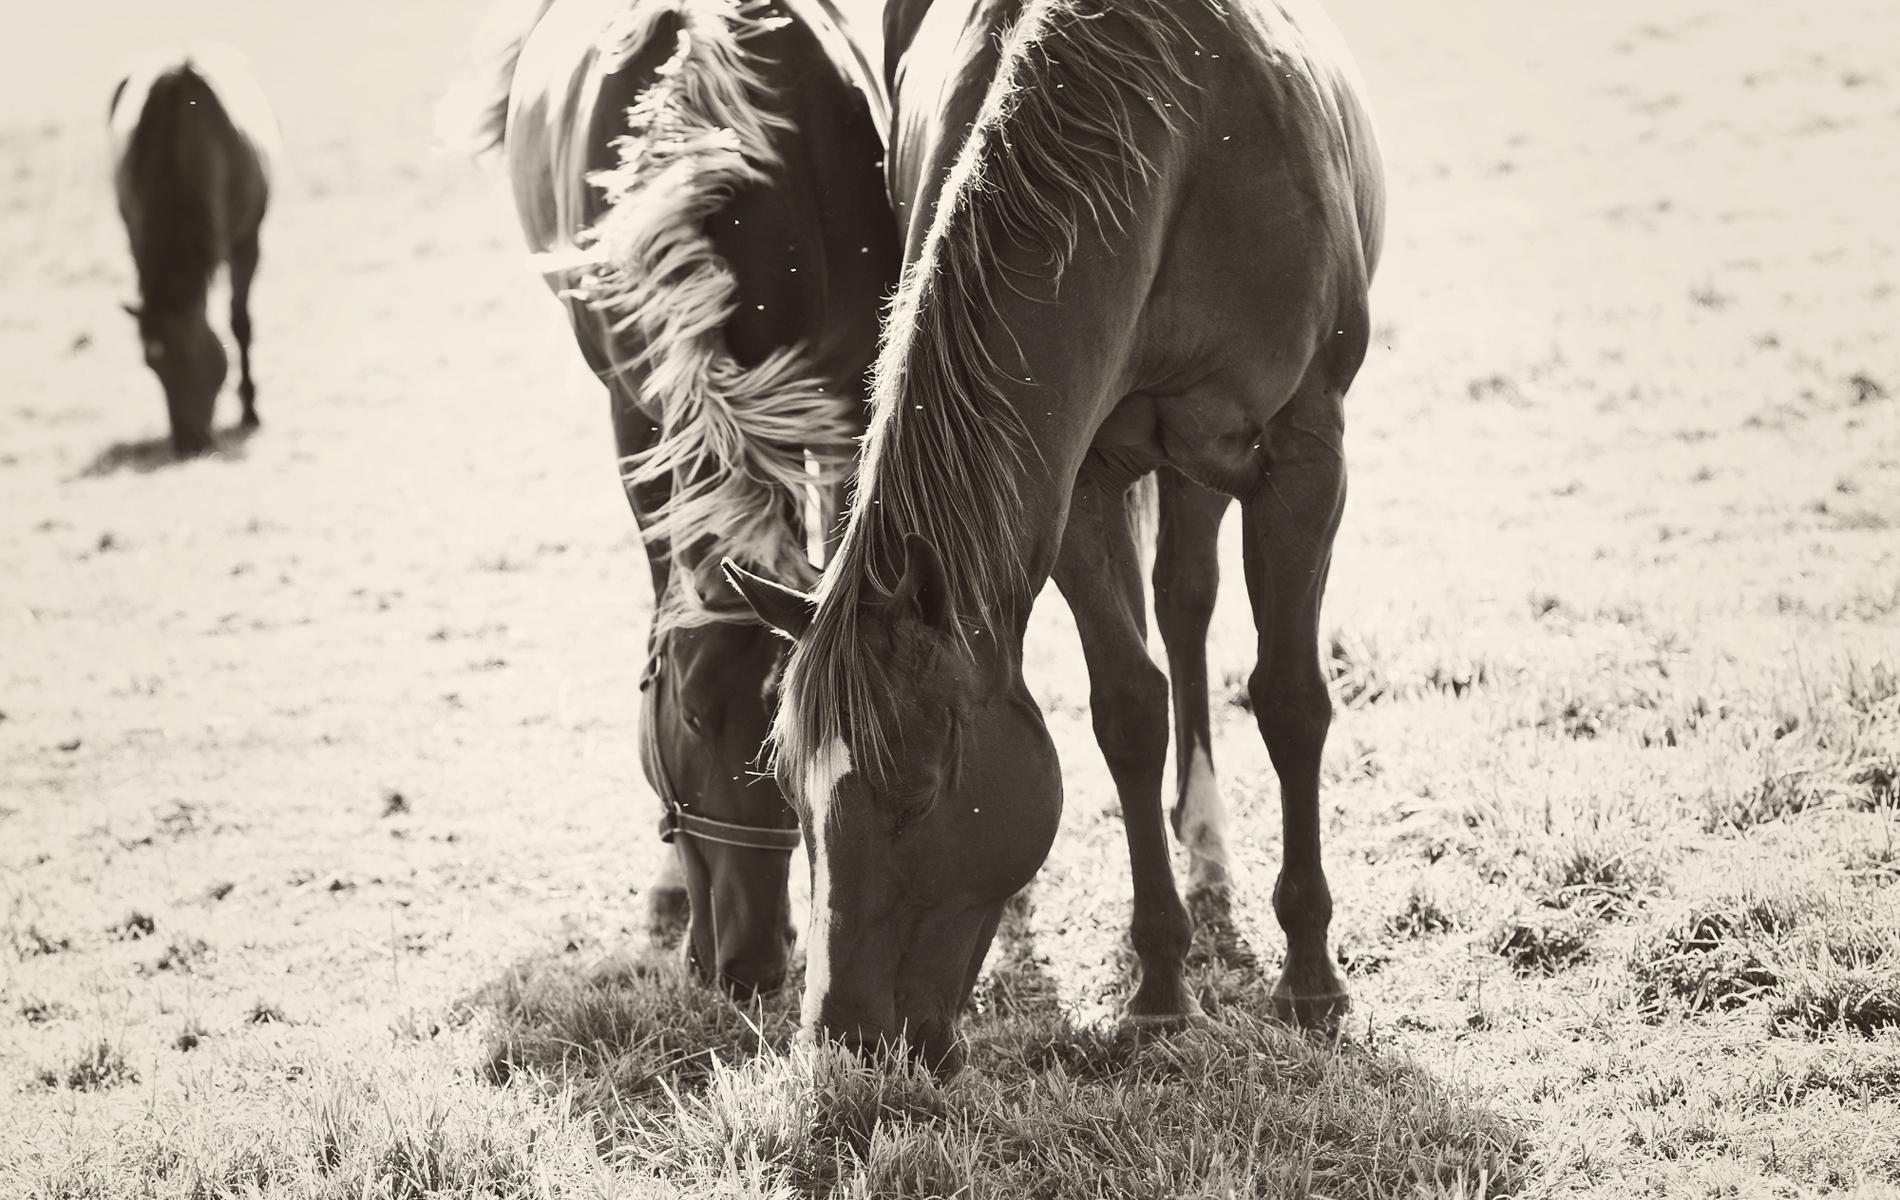 81337 скачать обои Животные, Лошади, Пара, Трава, Прогулка, Еда - заставки и картинки бесплатно